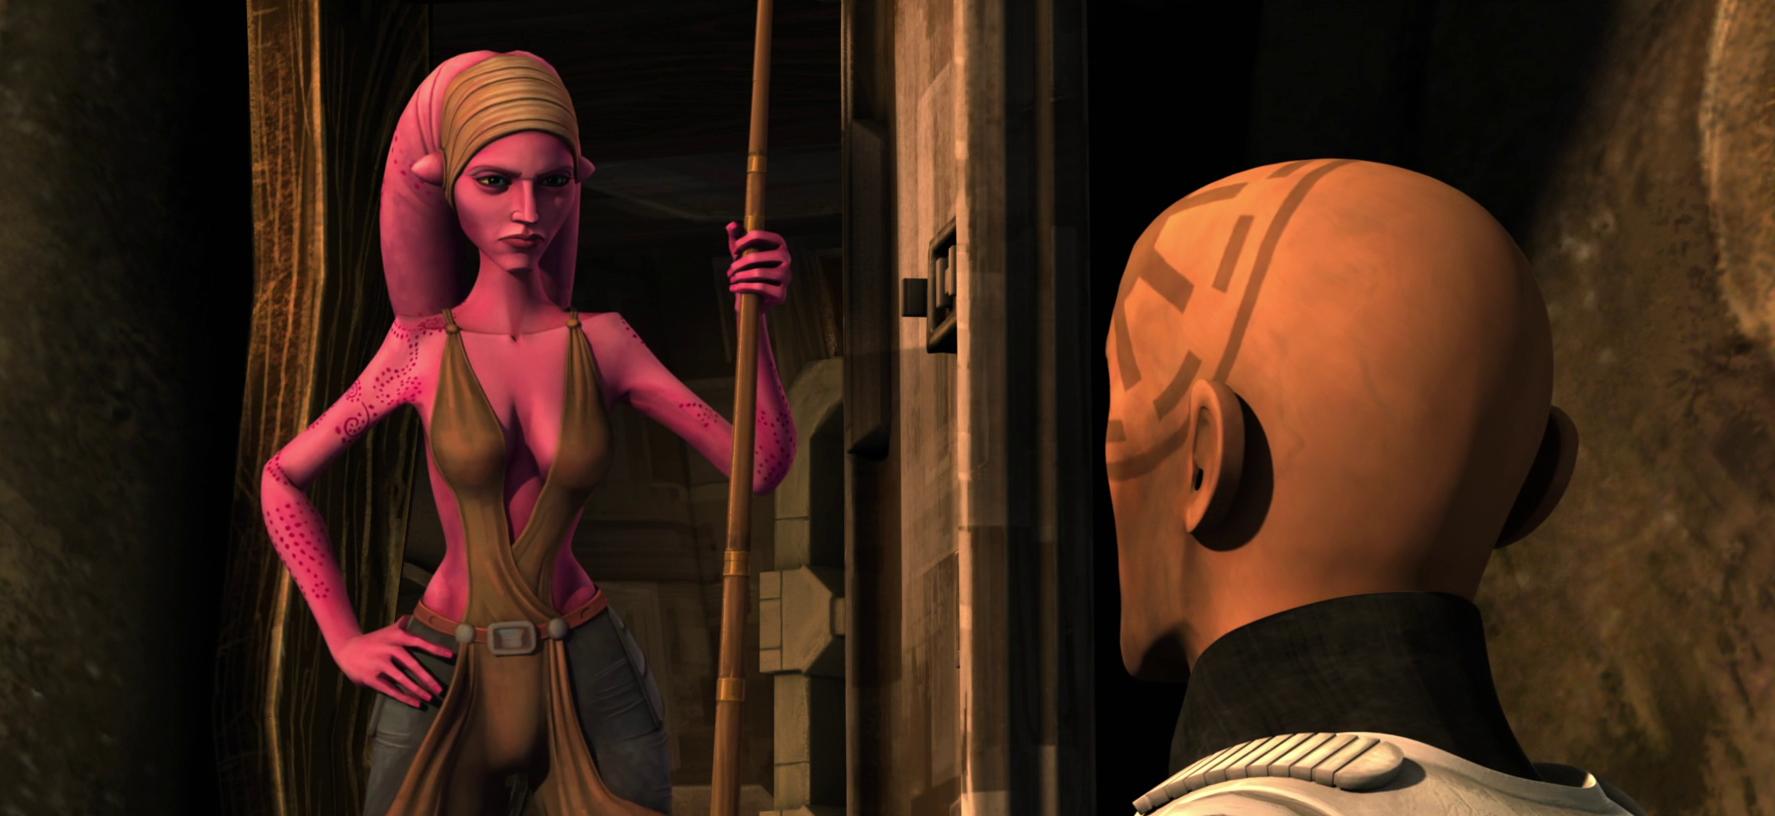 Starwars the clone wars sex erotic clip